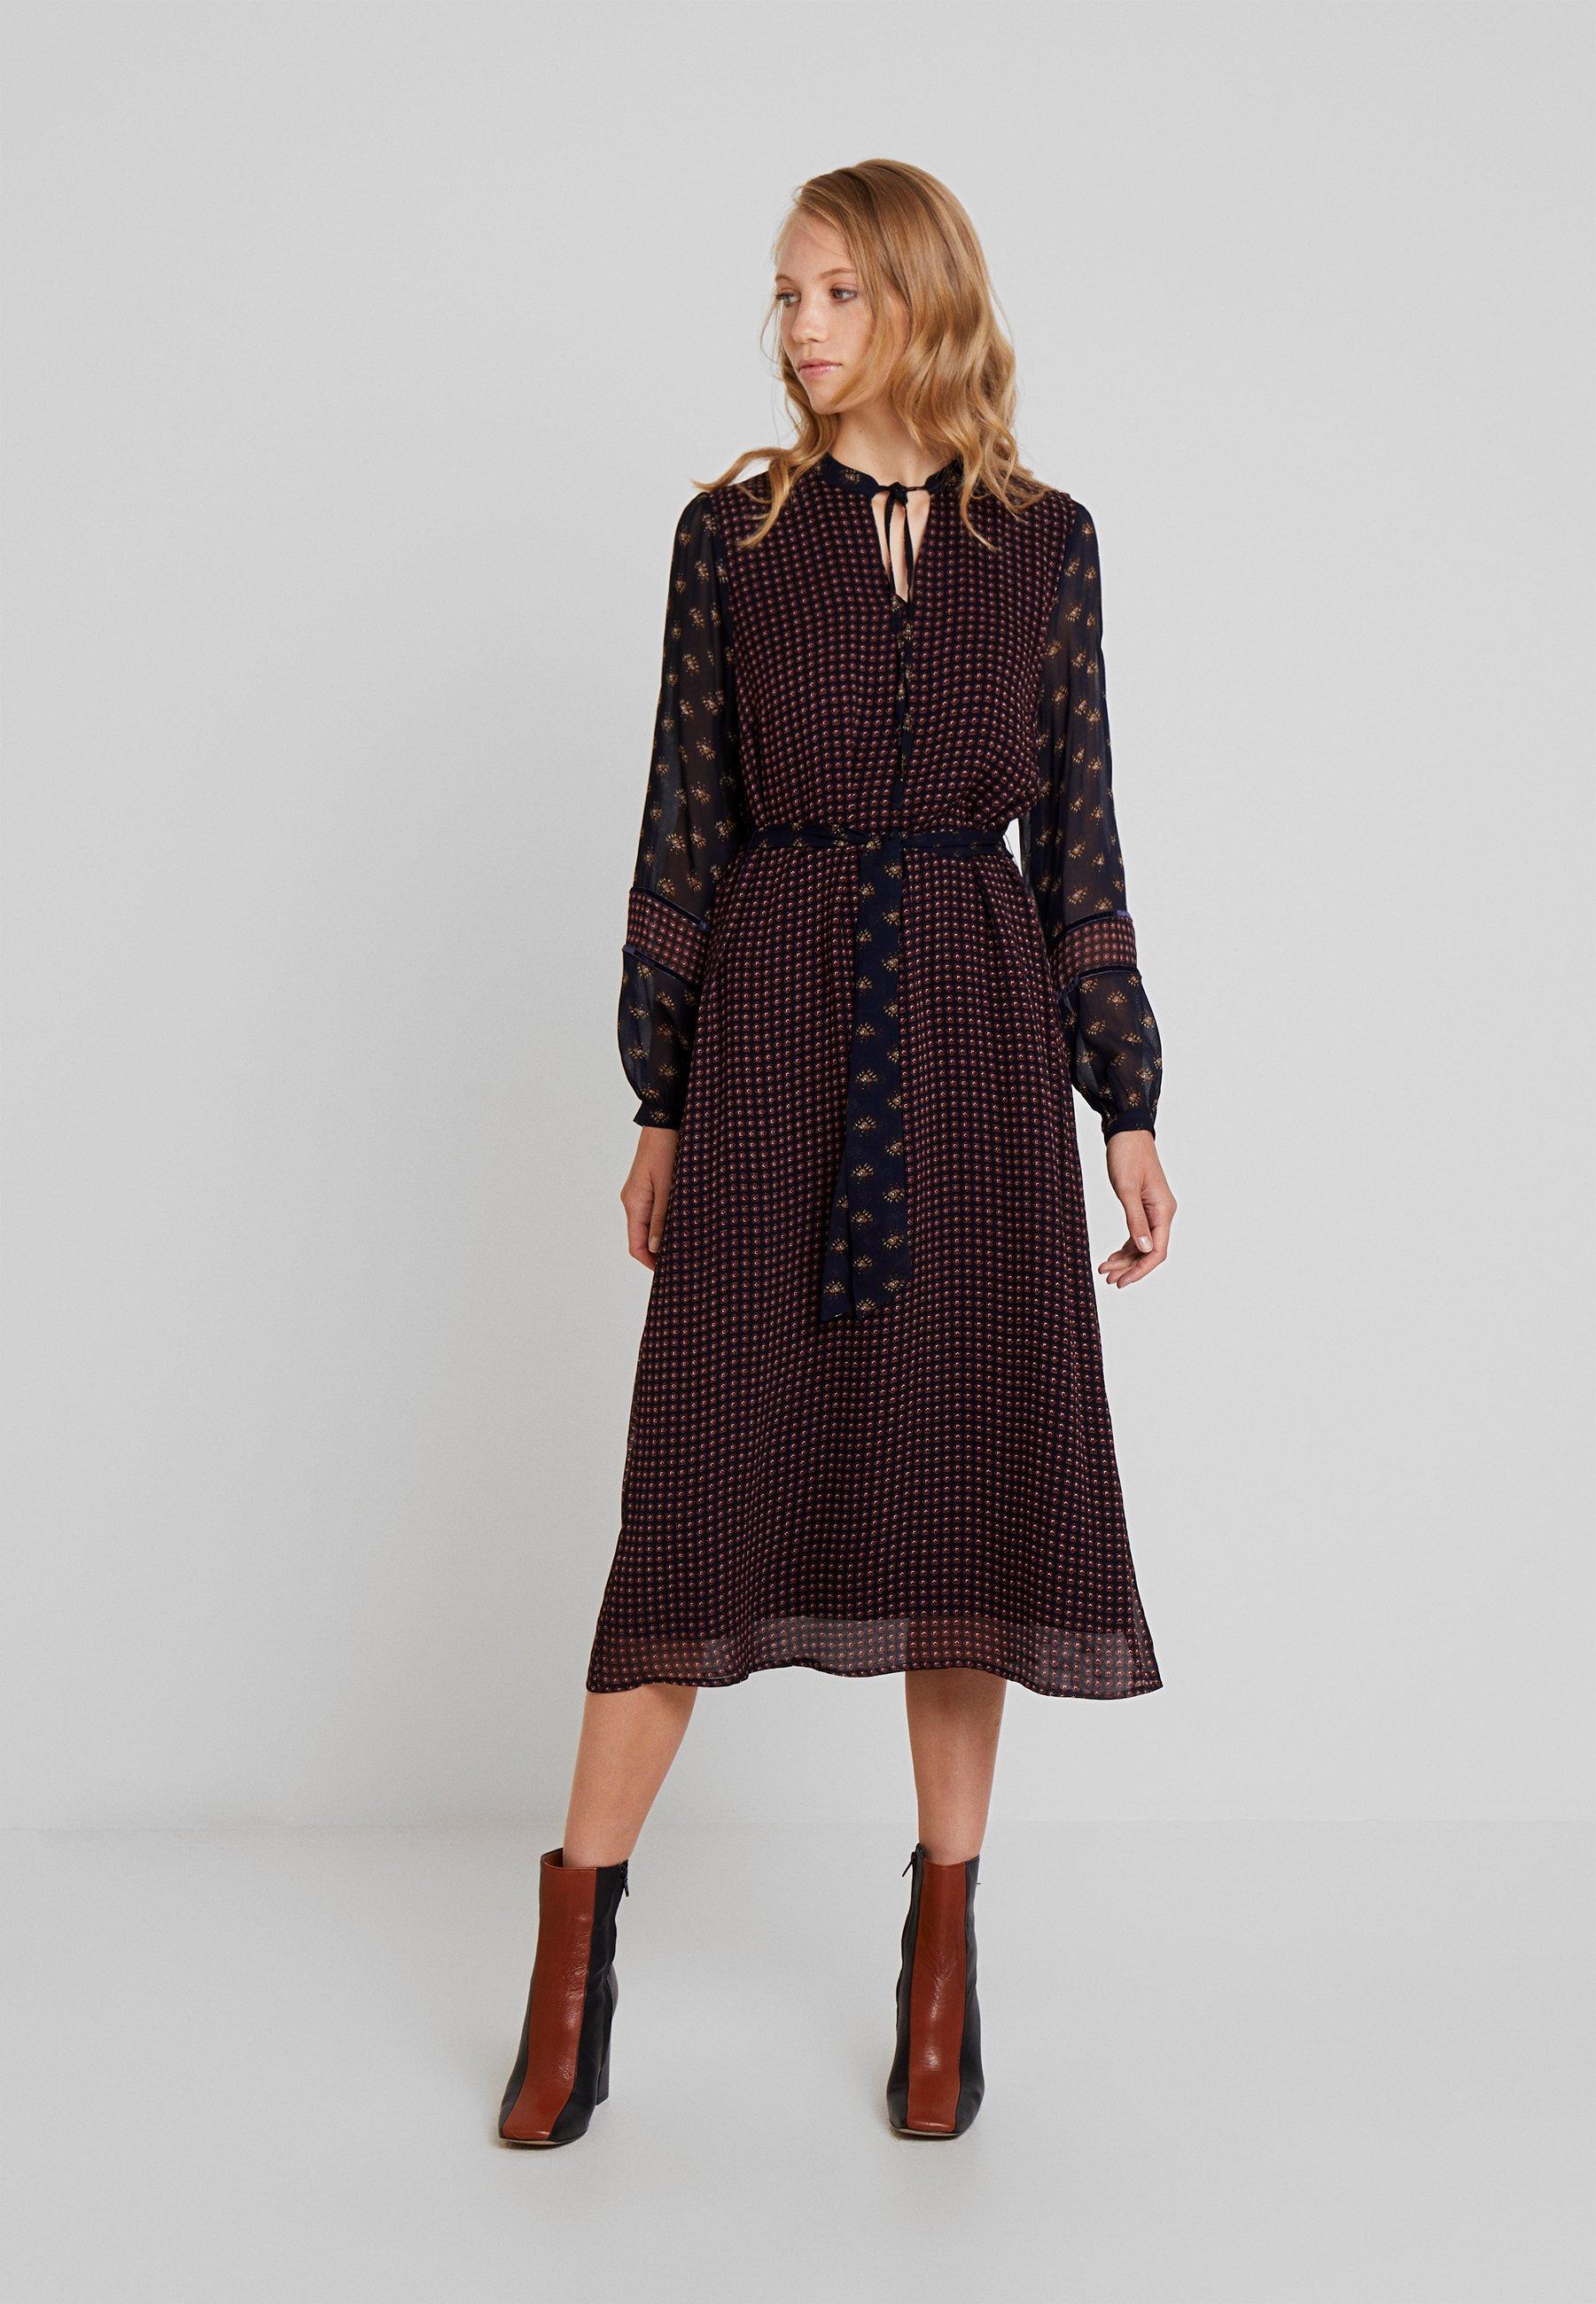 Moreamp; Robe Robe LongueMarine Moreamp; Multicolor LongueMarine NnO8w0vm